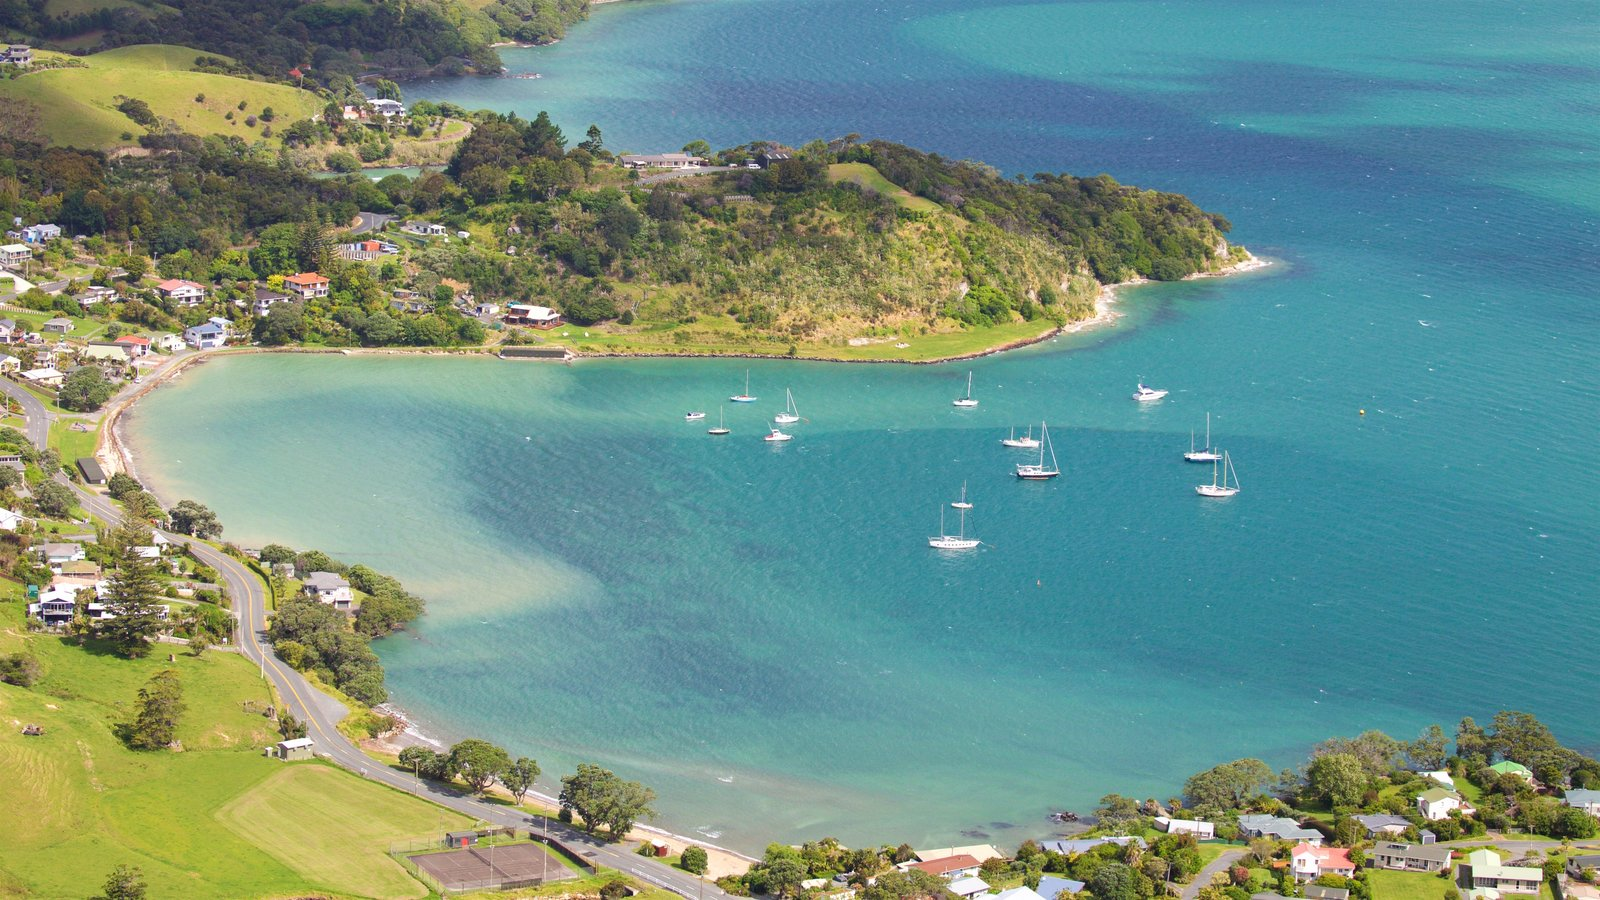 Mount Manaia showing a bay or harbor, sailing and a coastal town